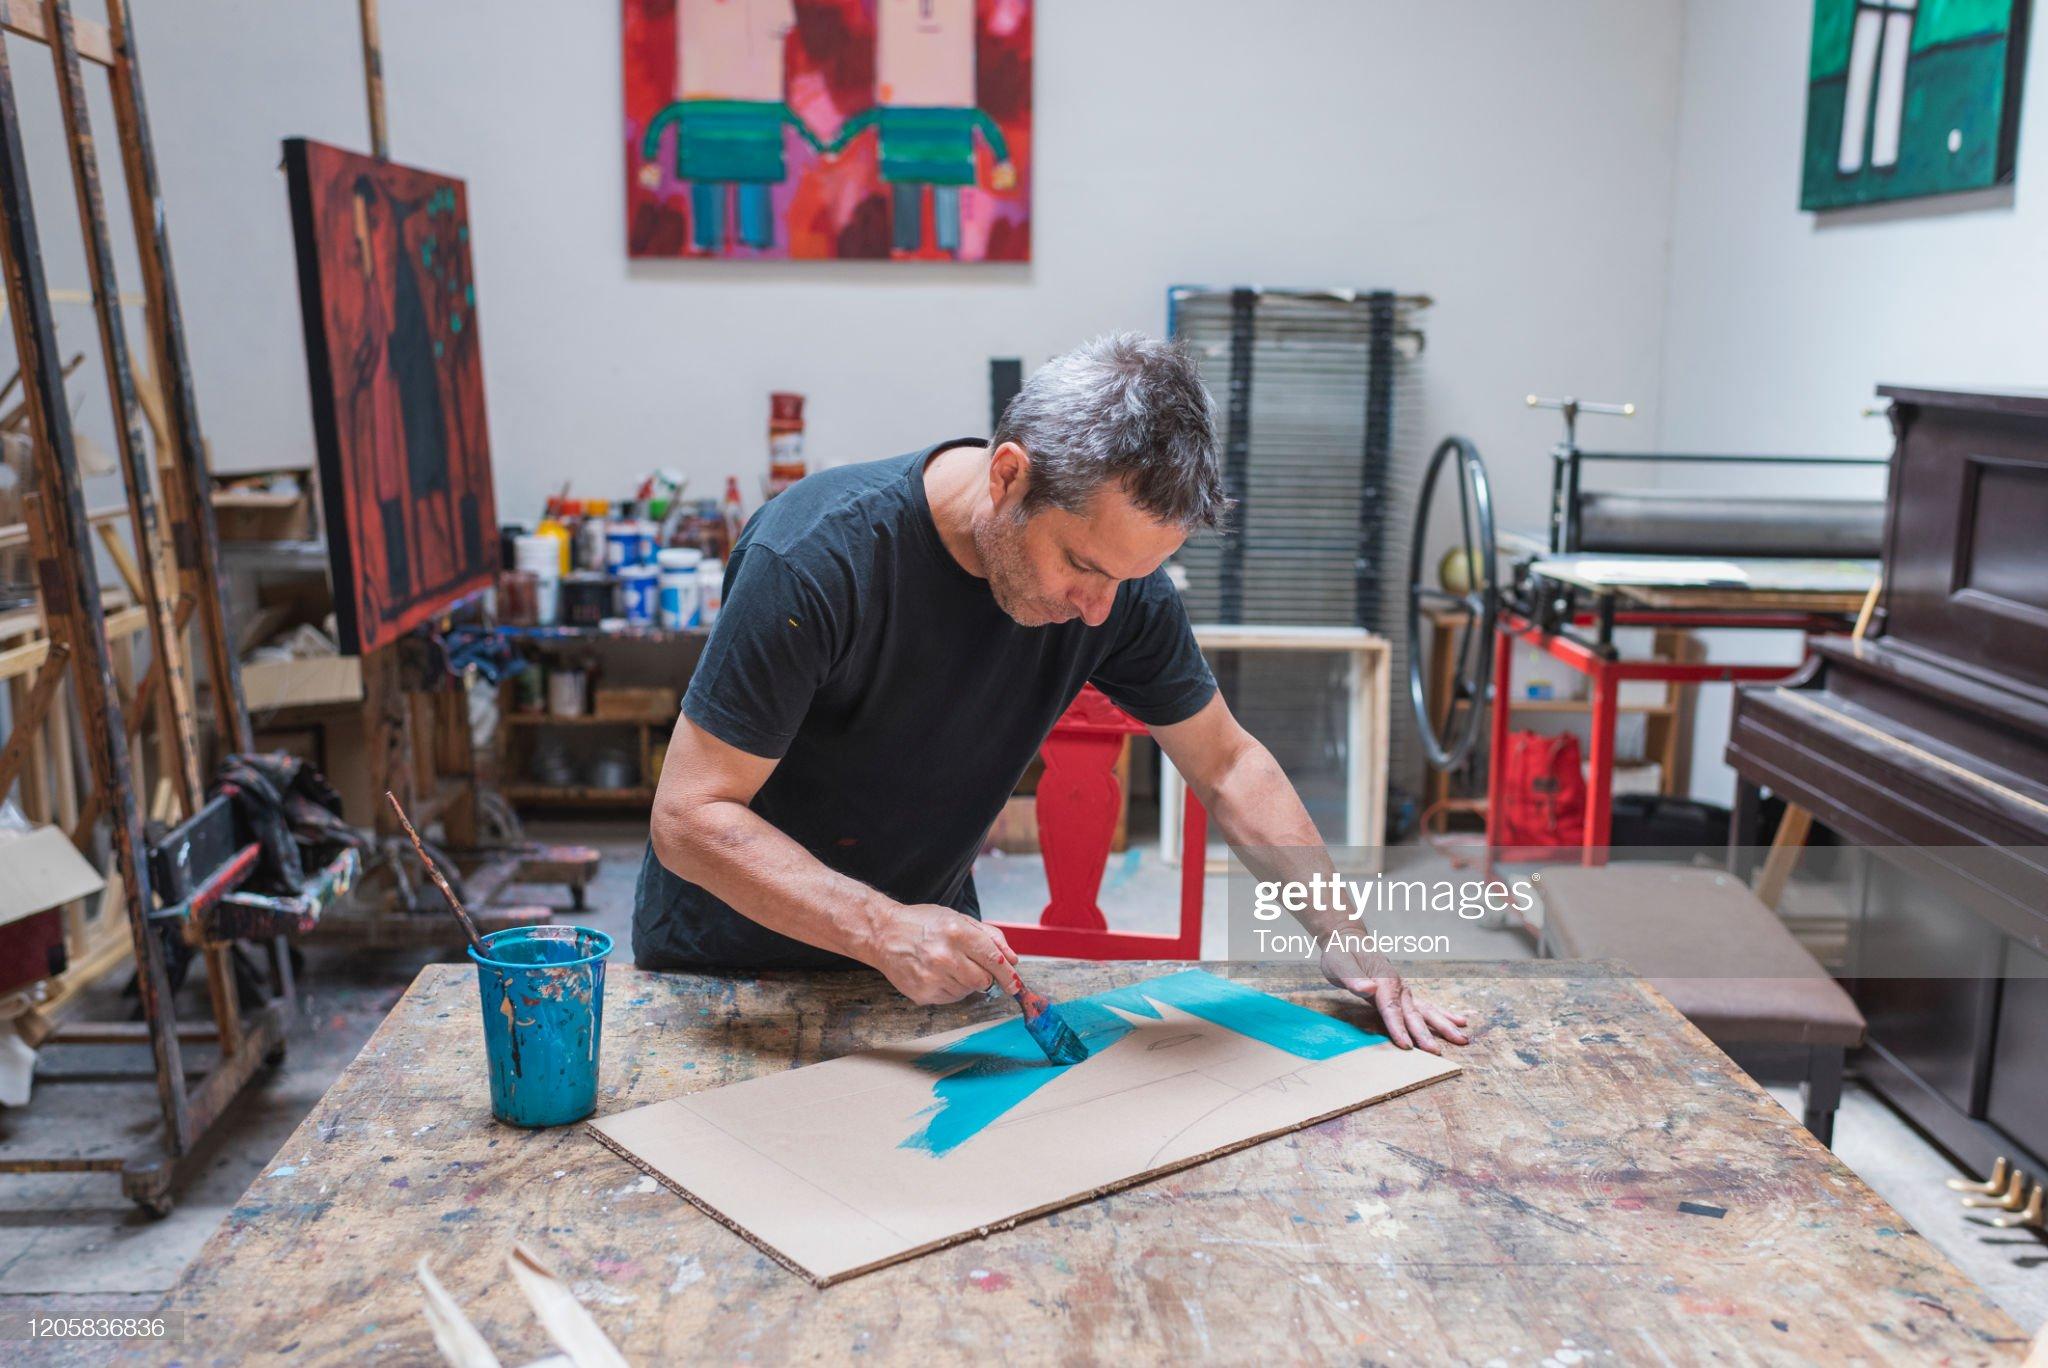 Artist painting in his studio : 圖庫照片